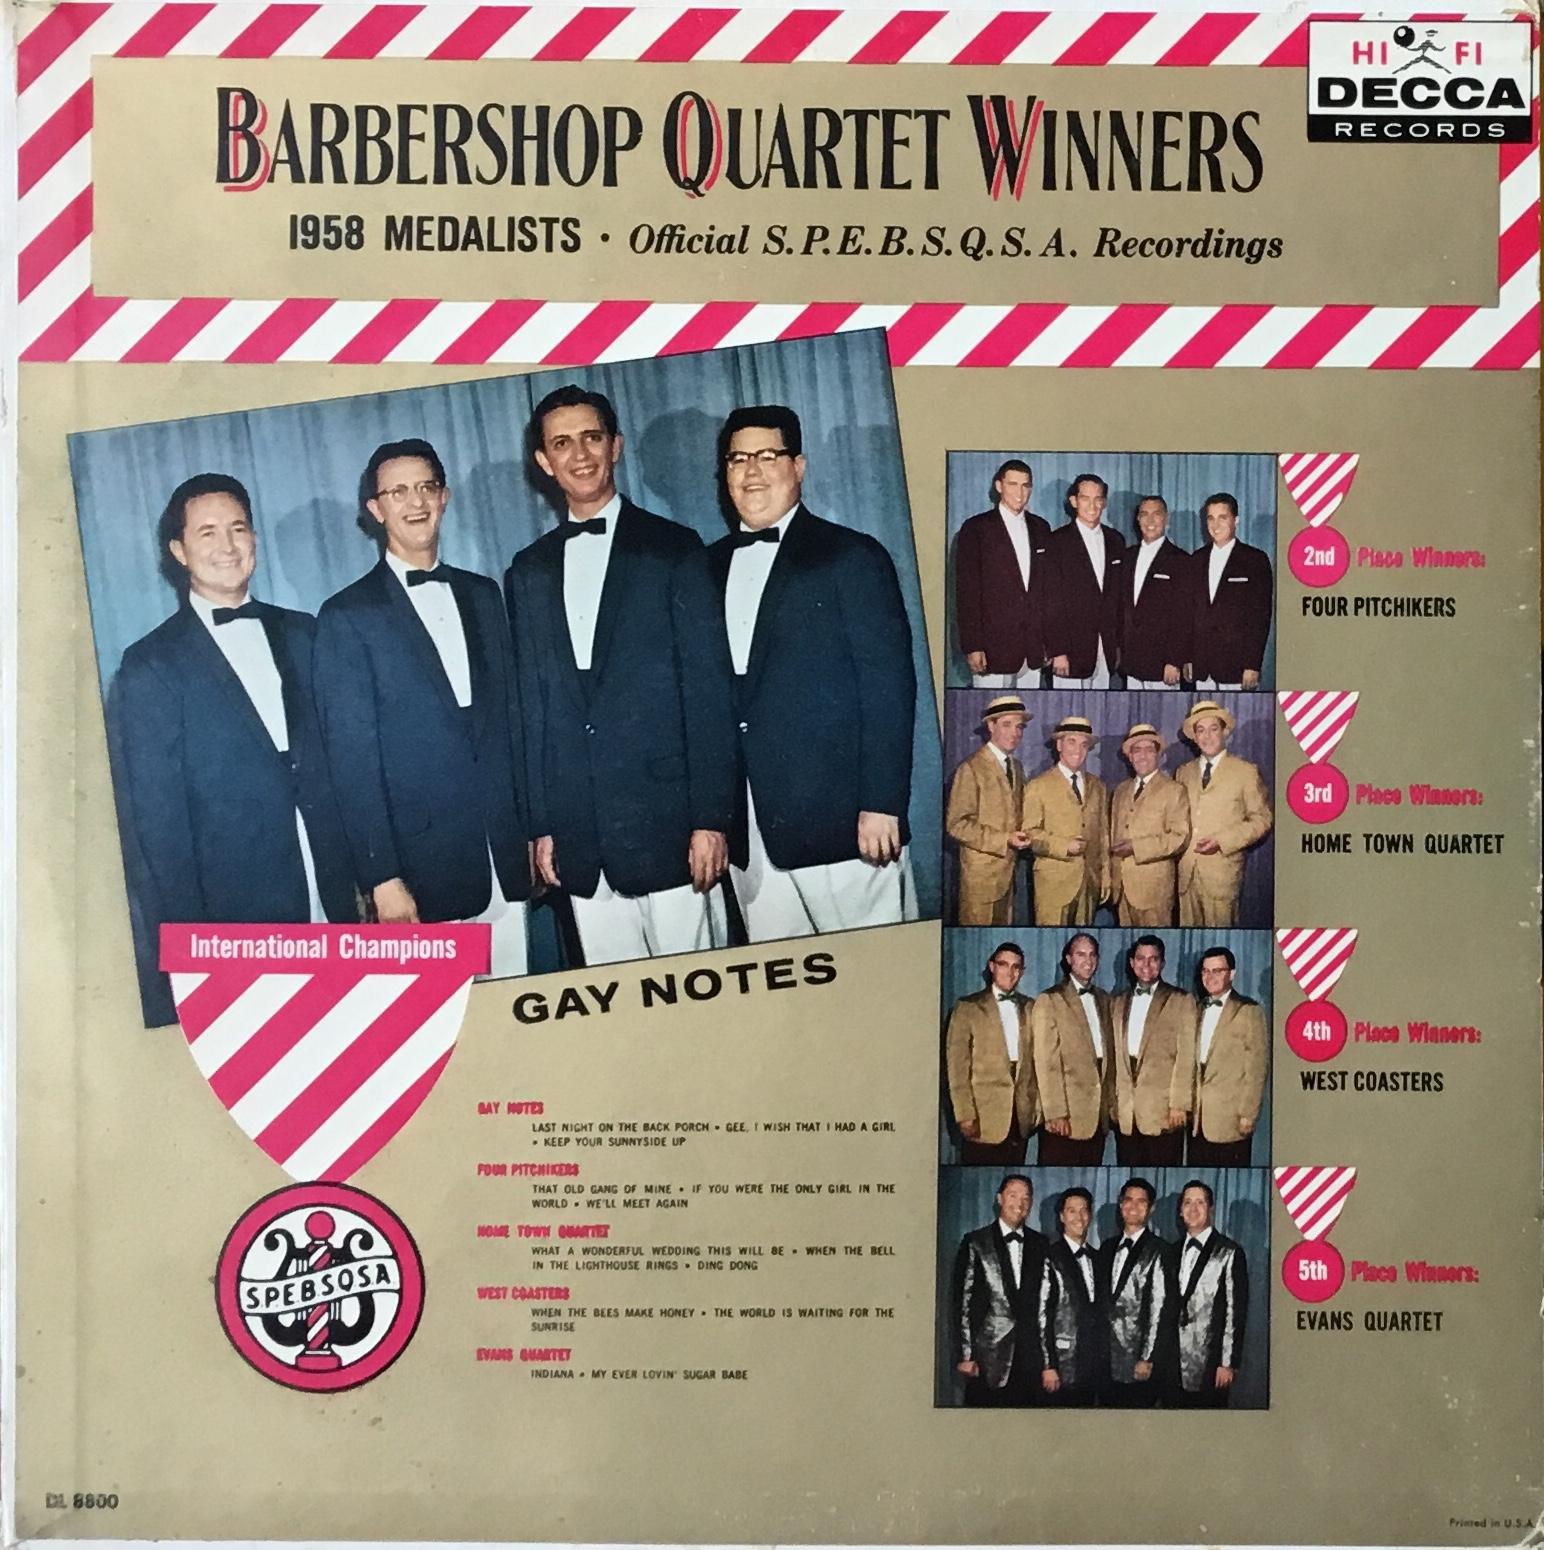 BarbershopQuartet1958